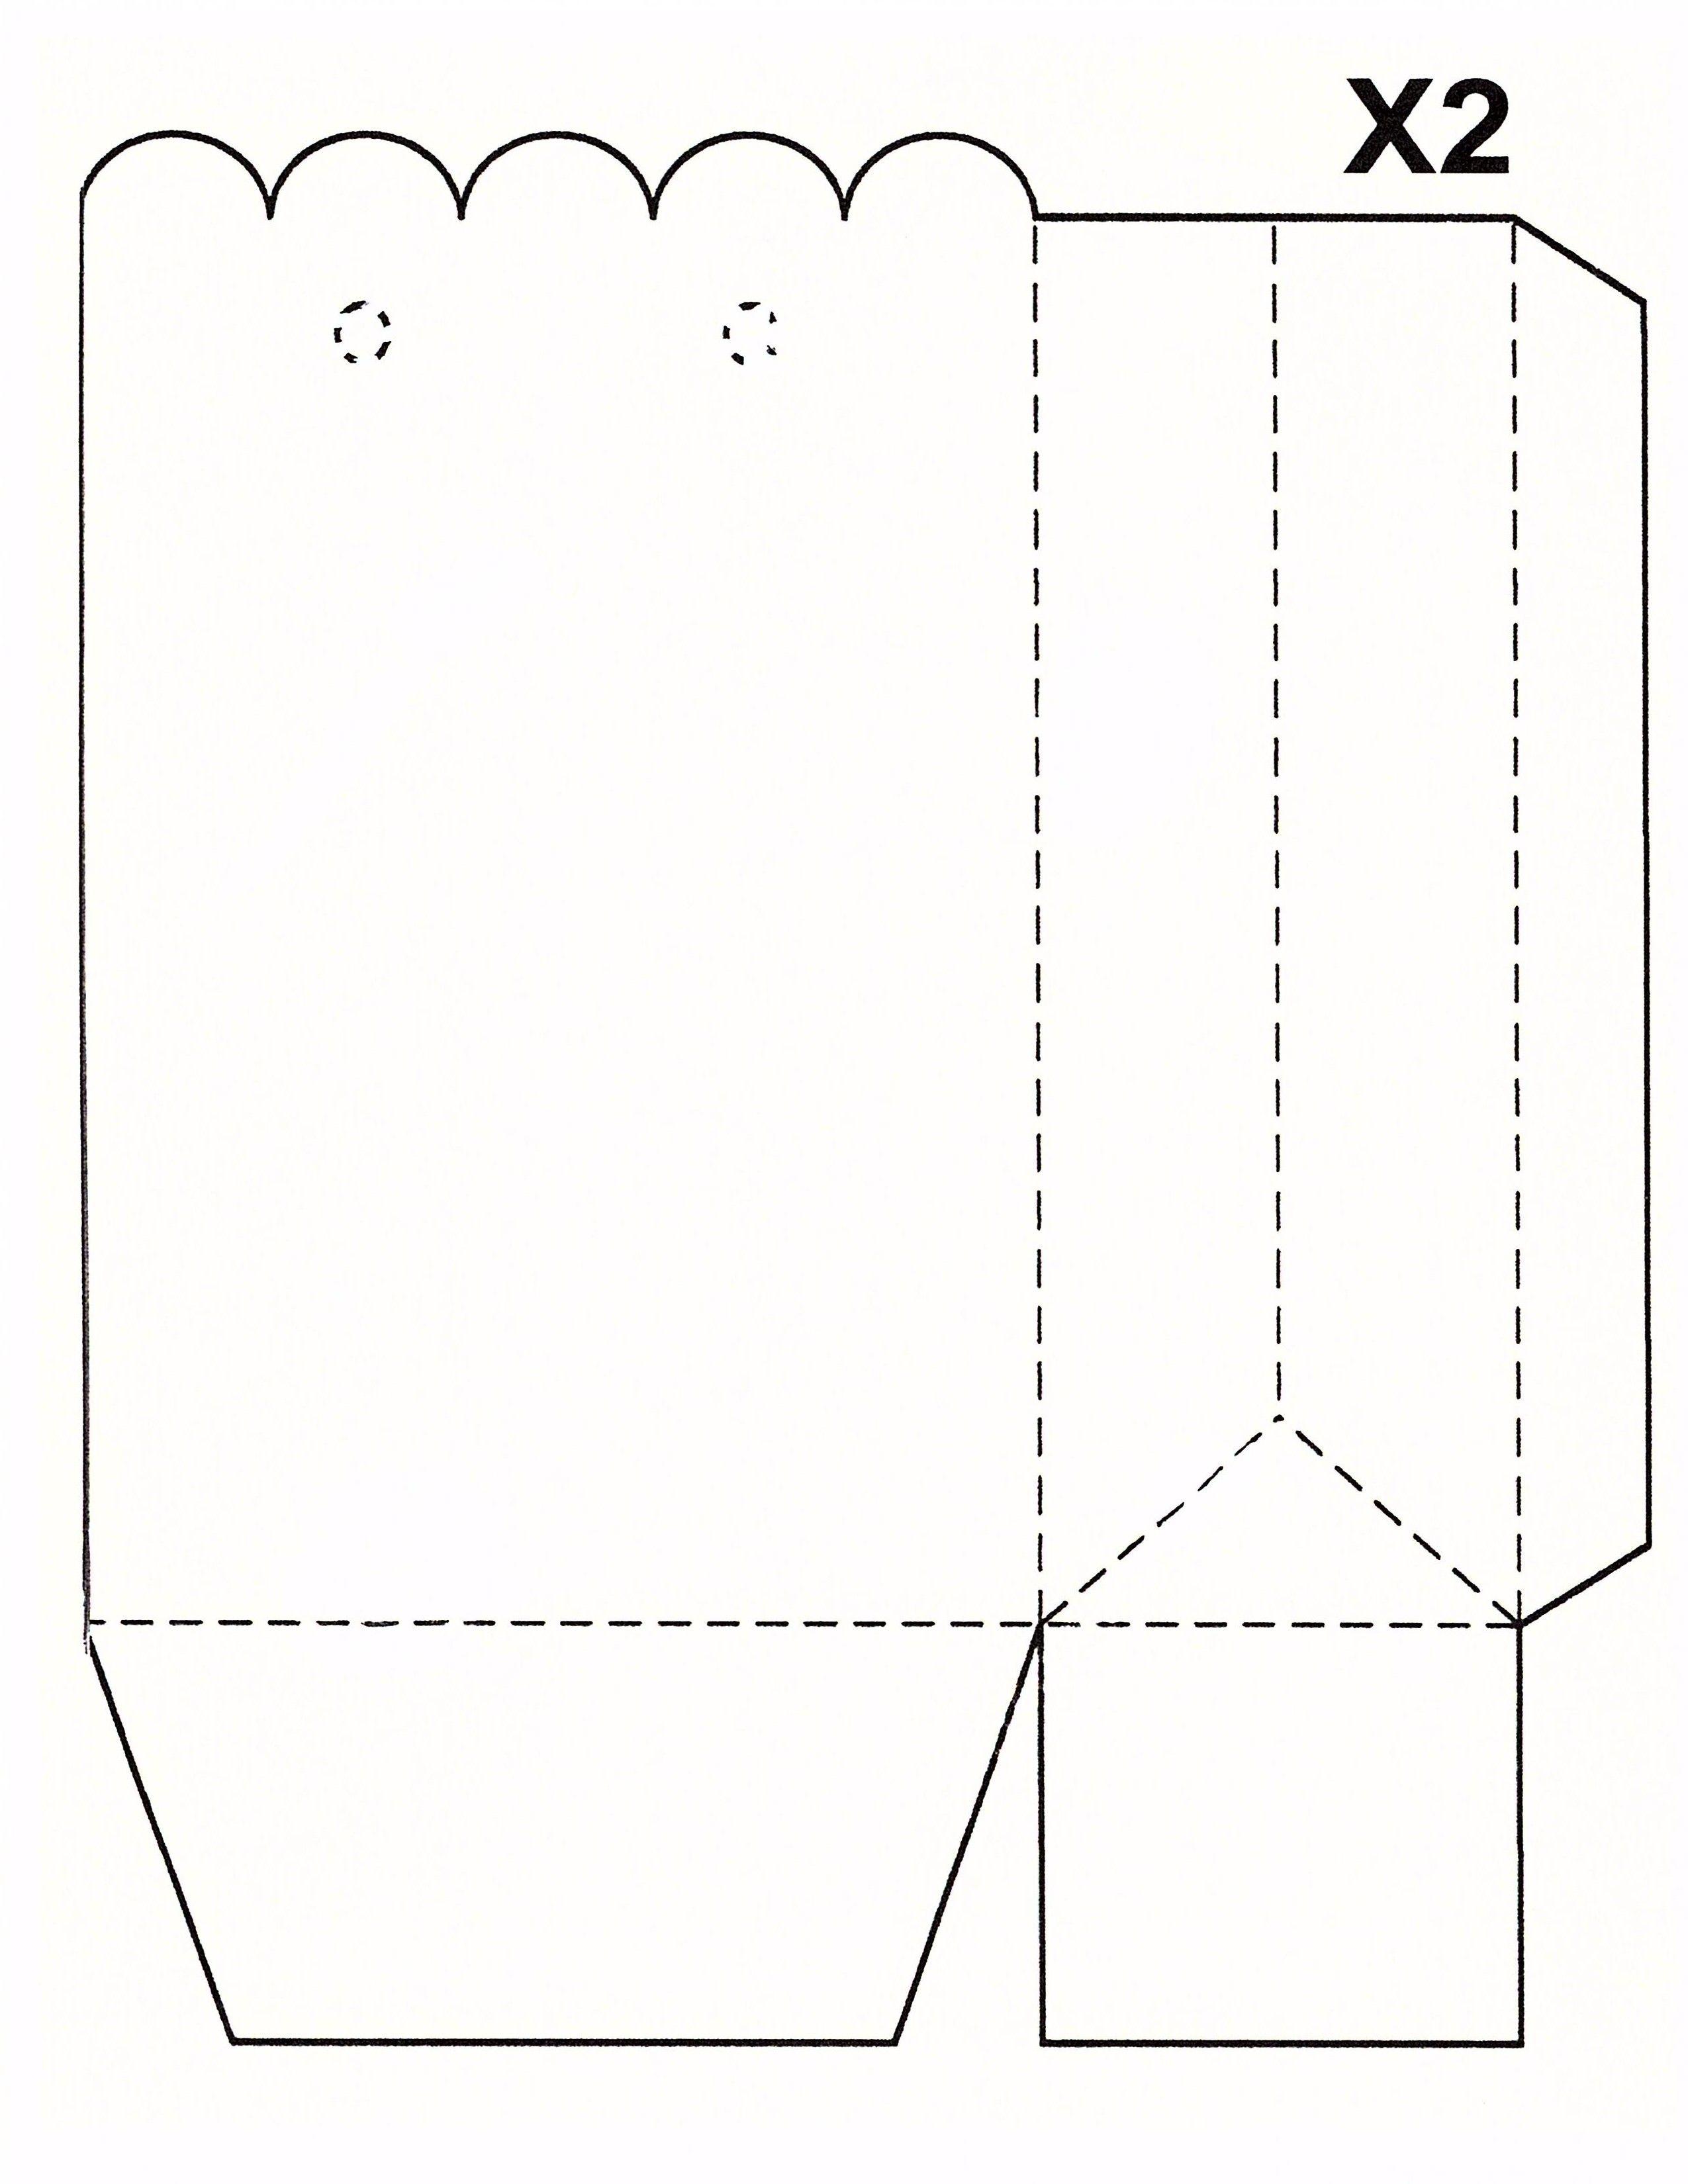 Scallop top X2 bag | Blank Templates | Pinterest | Scalloped tops